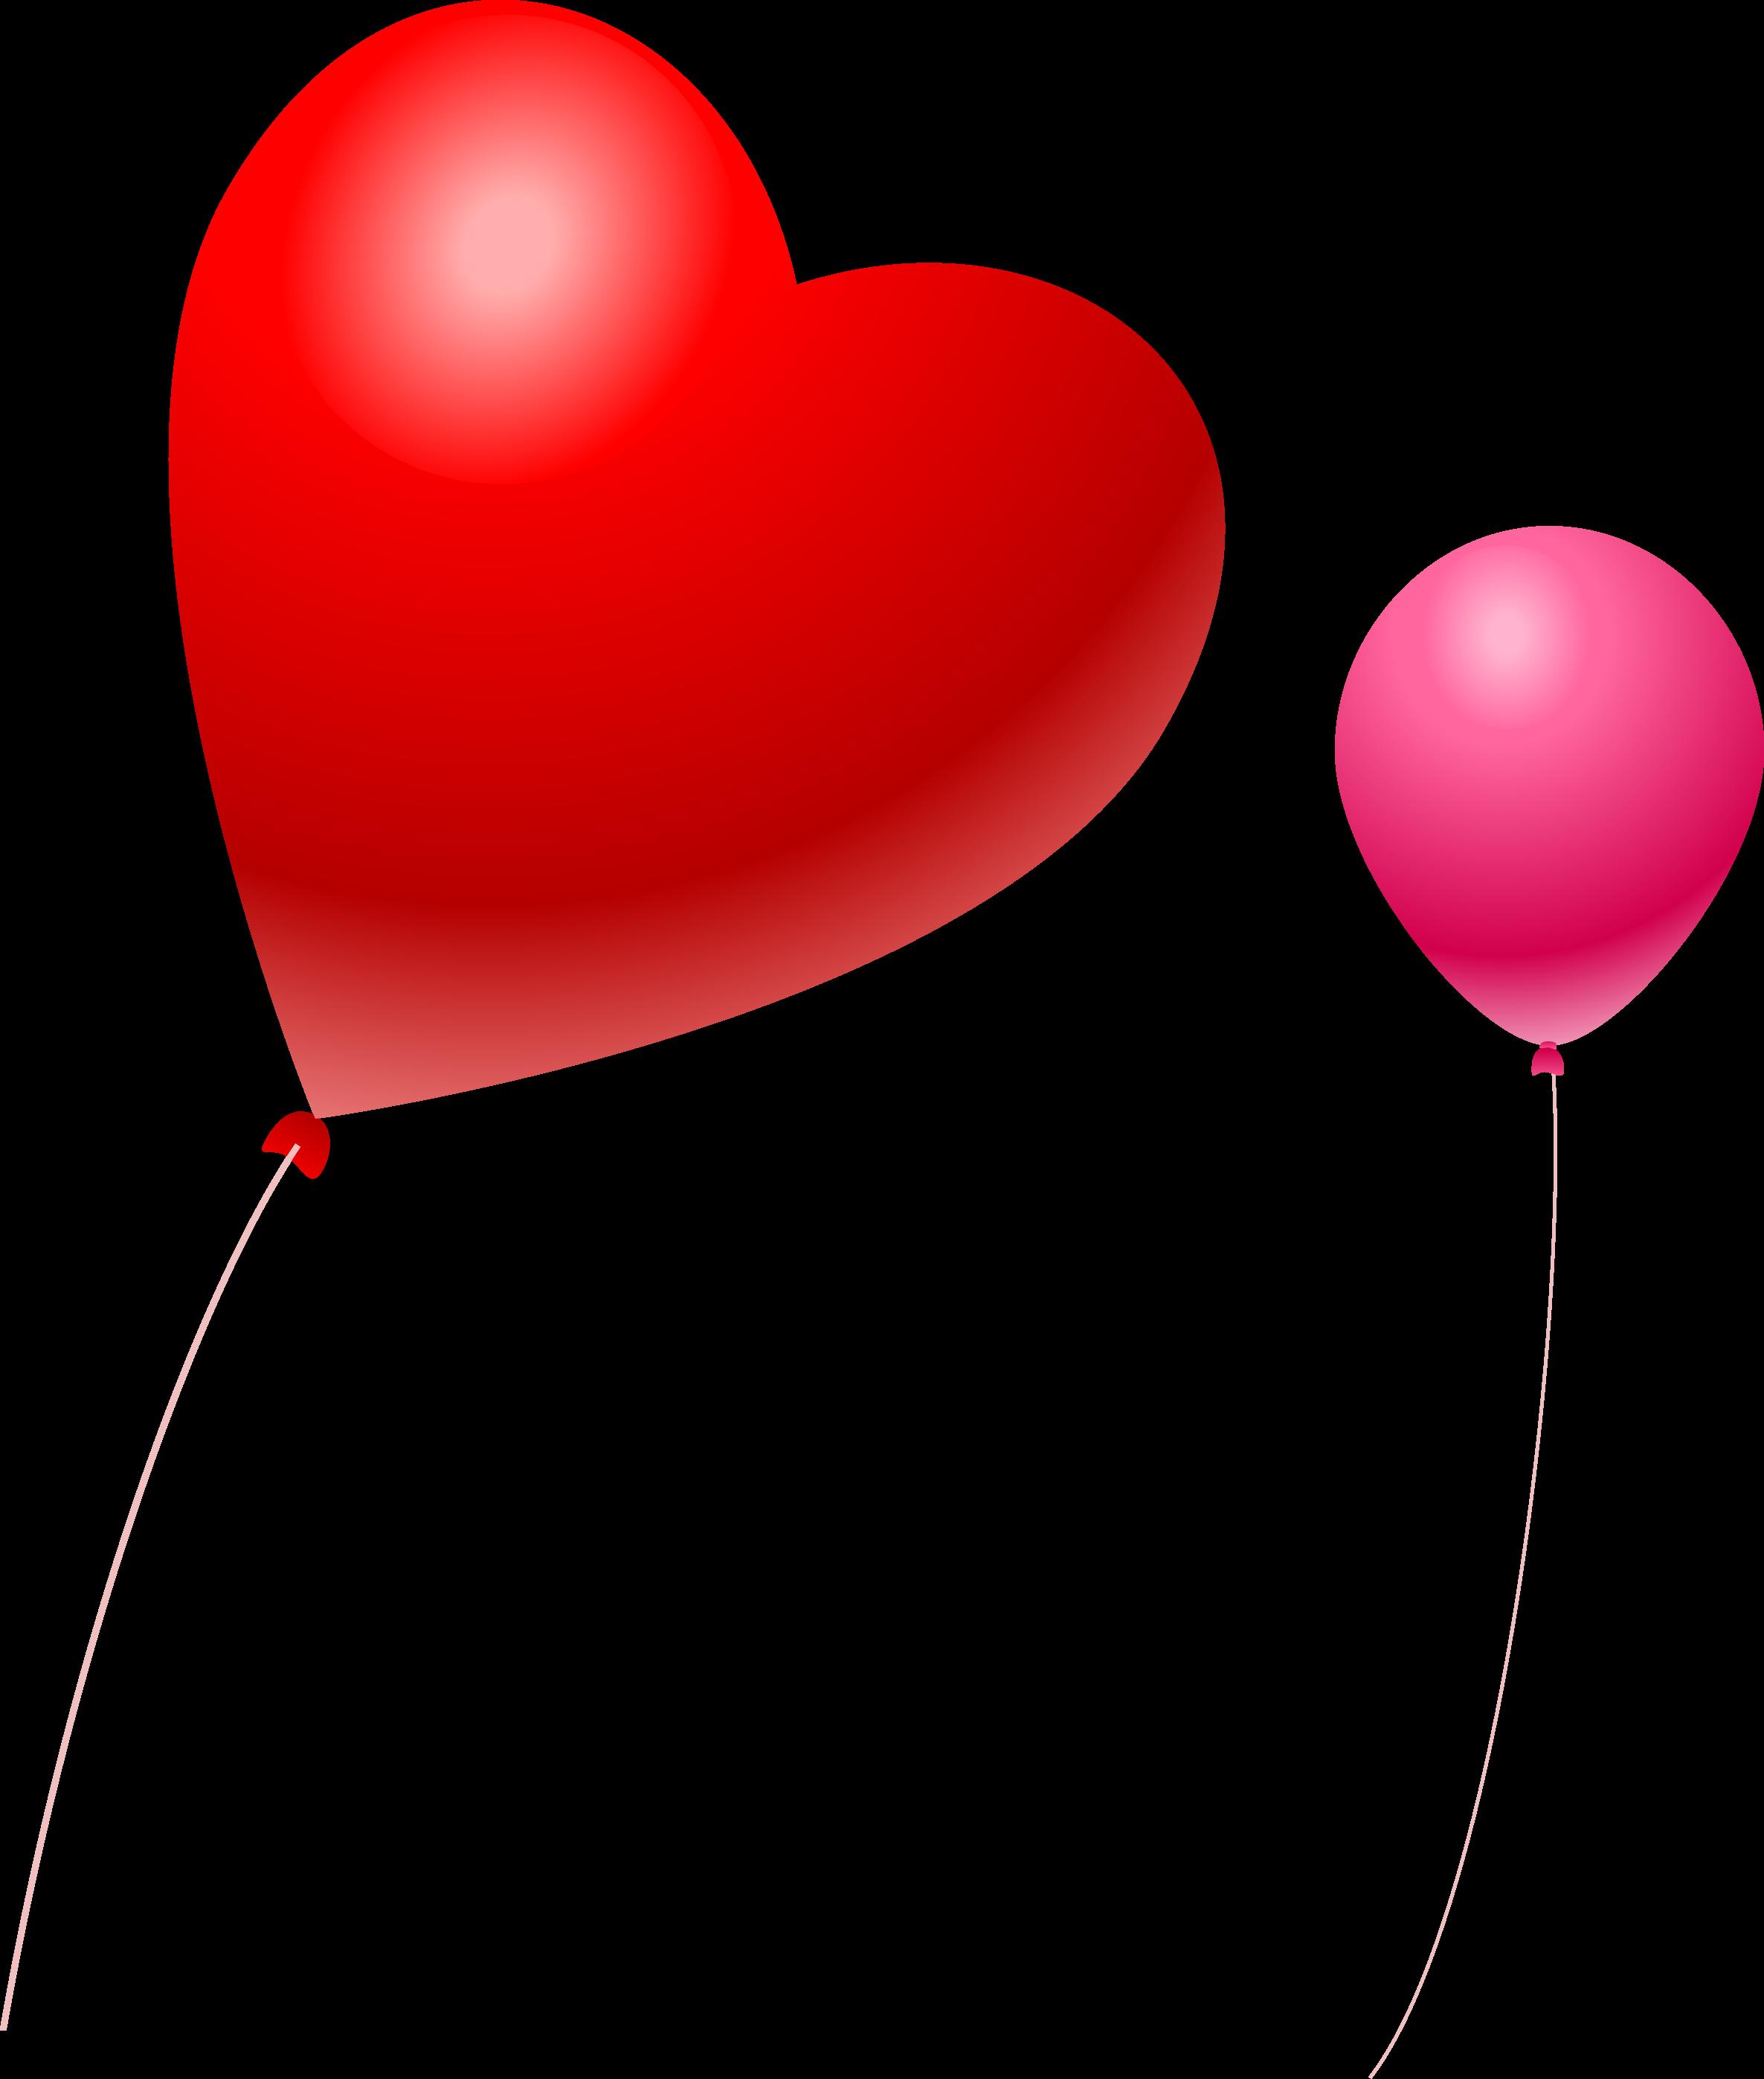 vector download Vector balloon. Transprent png free download